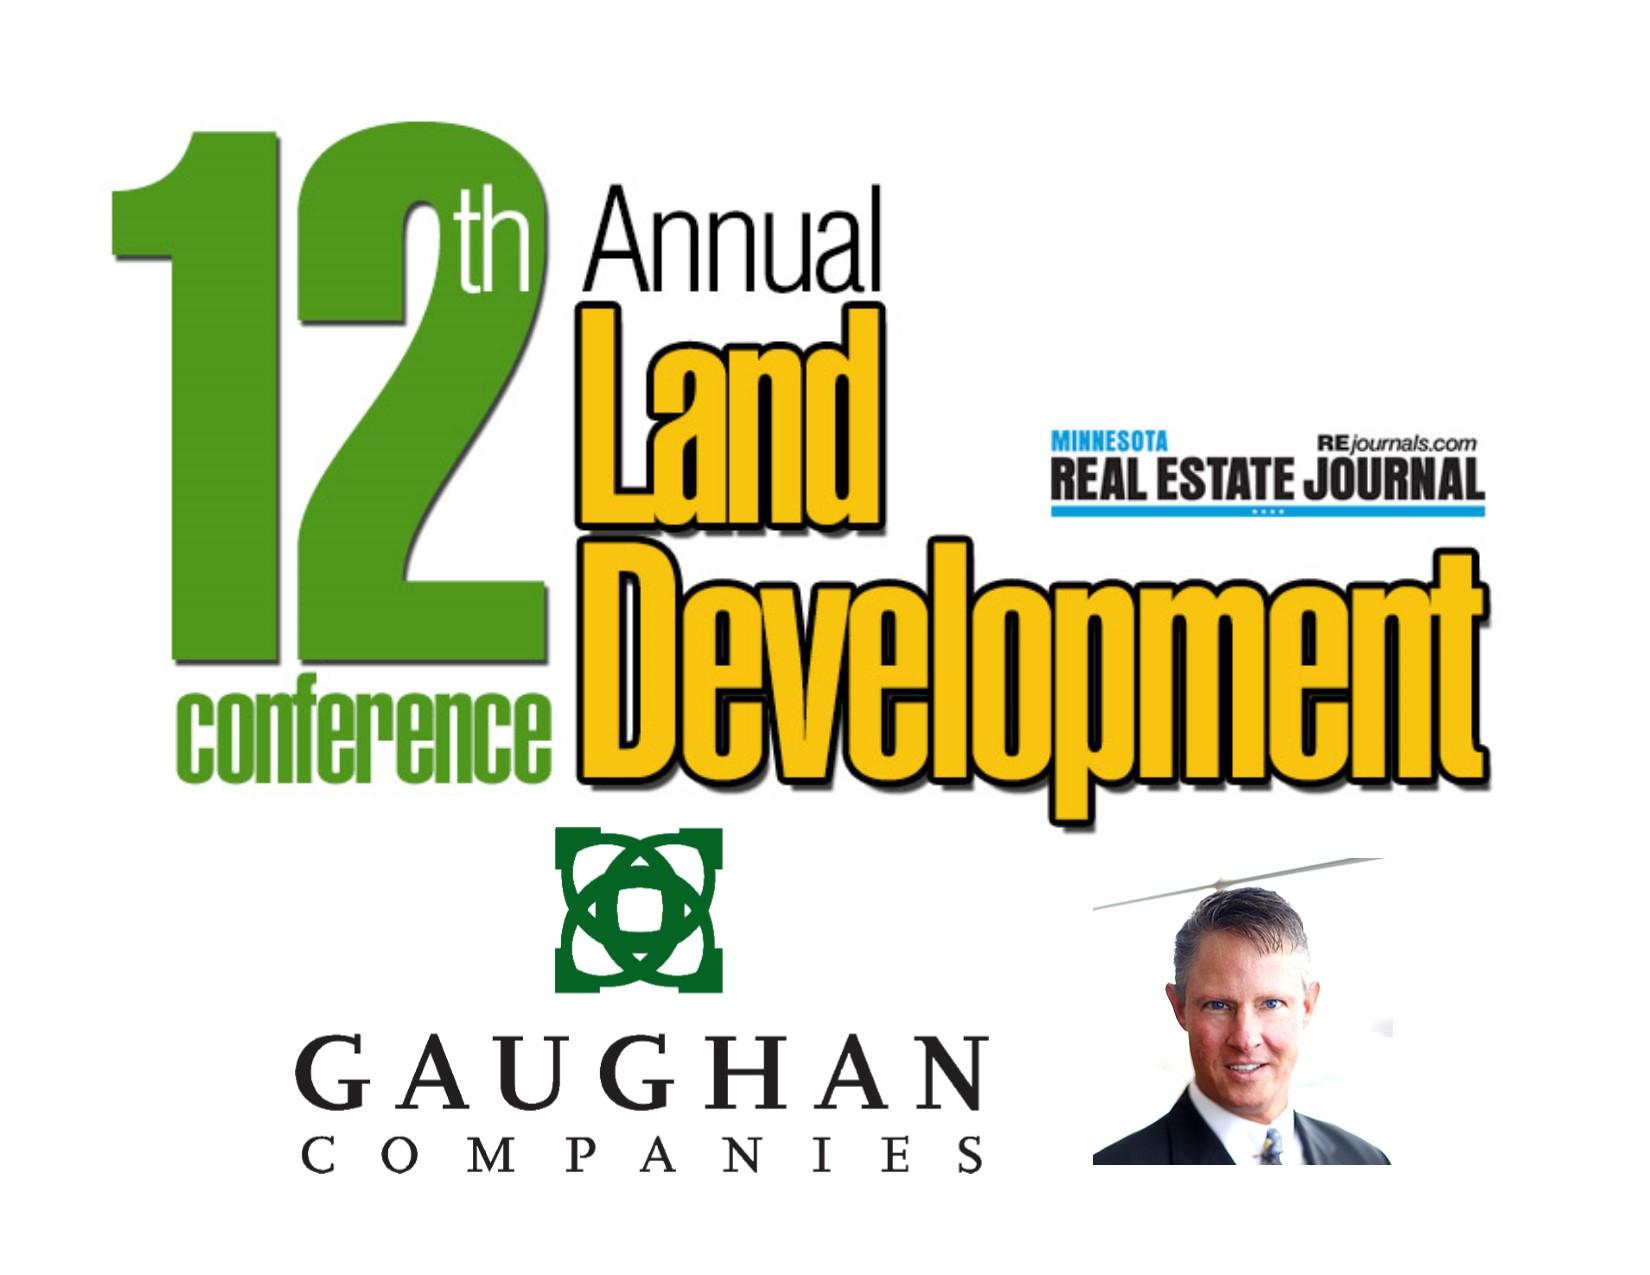 Land Development Conference - MN Real Estate Journal